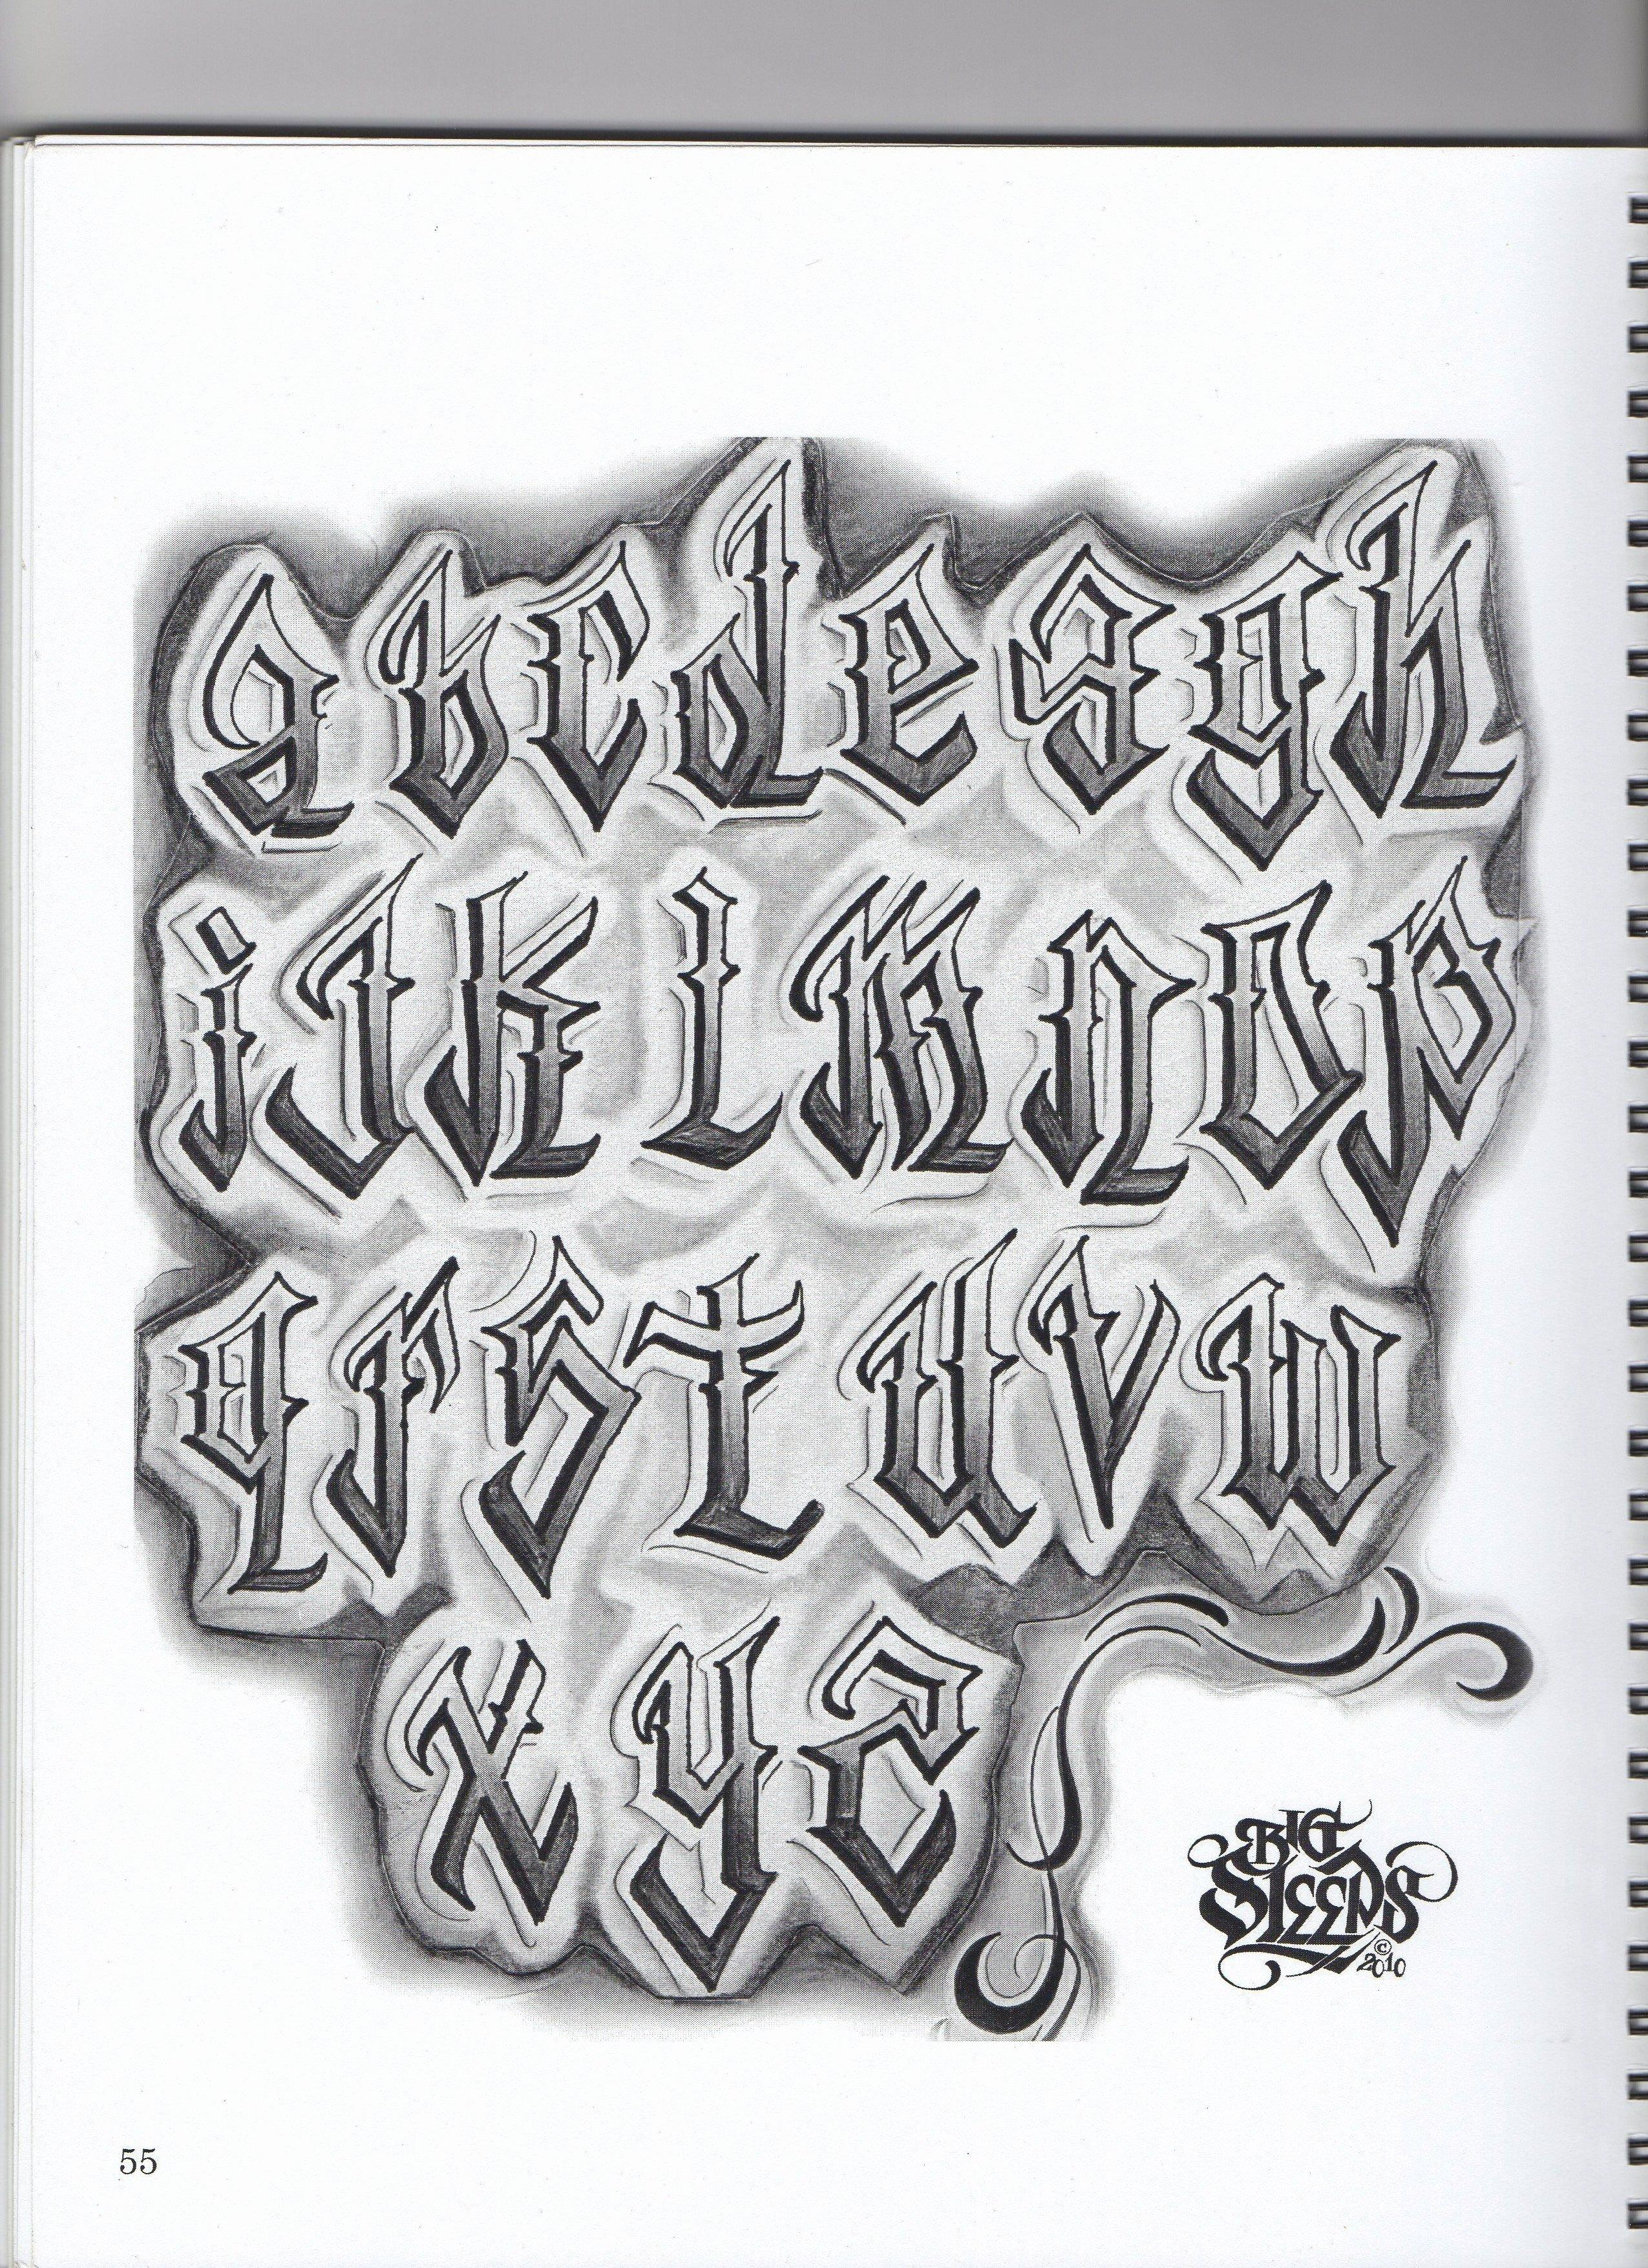 Letter Fonts for Tattoos Lovely Big Sleep … Lettering